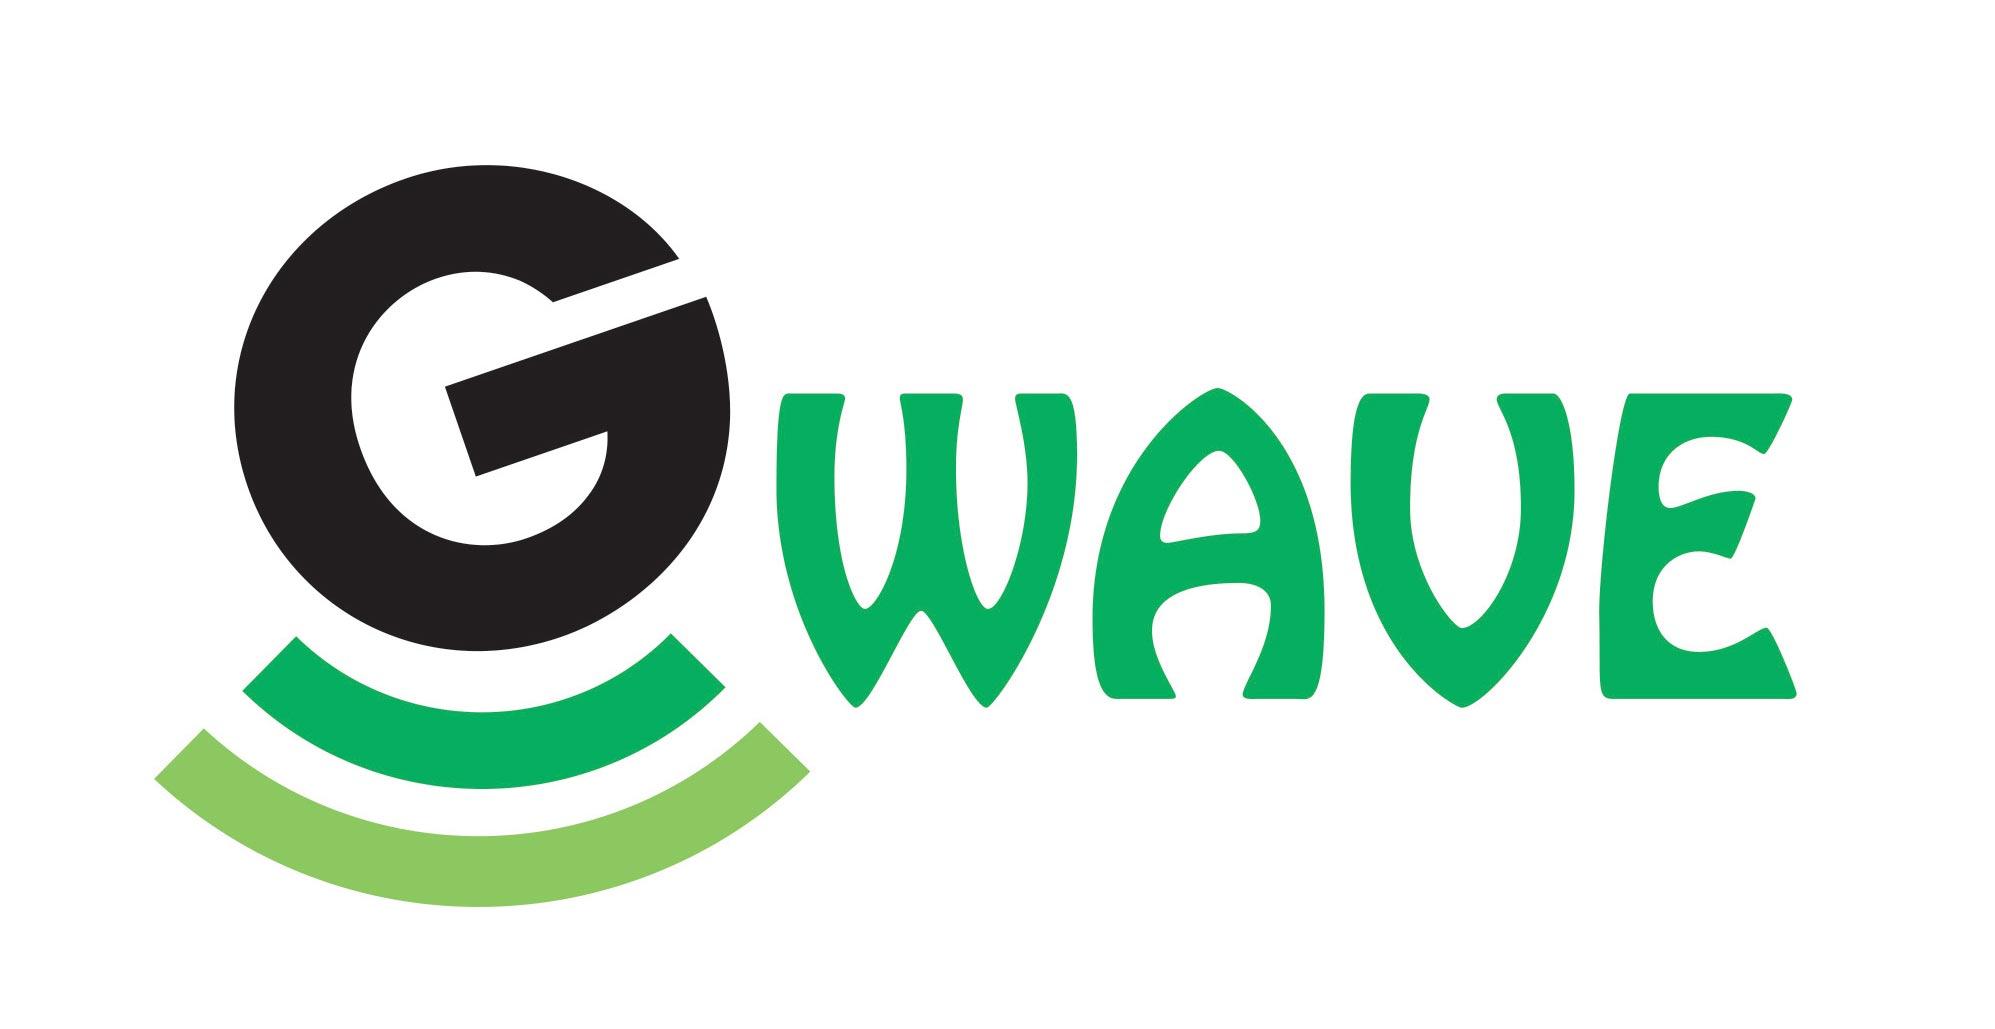 G-wave